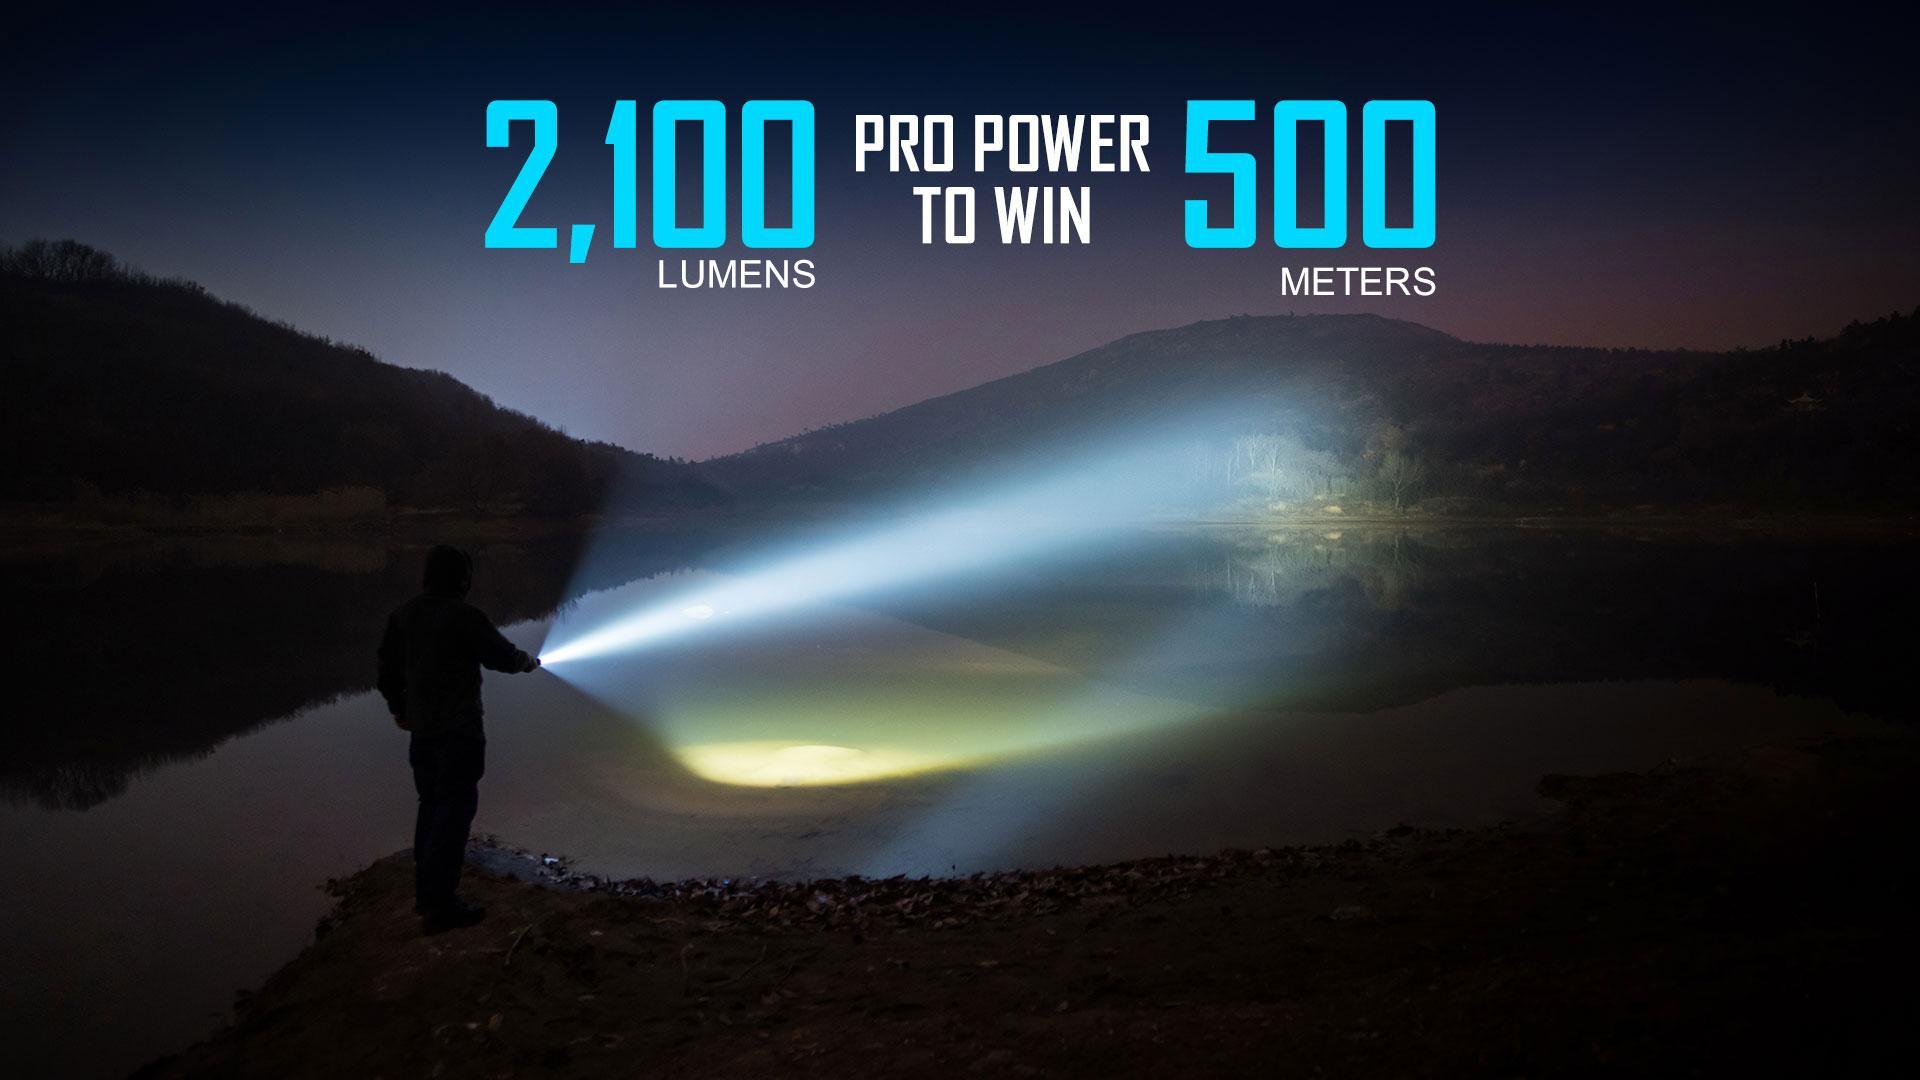 Warrior X Pro 2100 lumens tactical flashlight